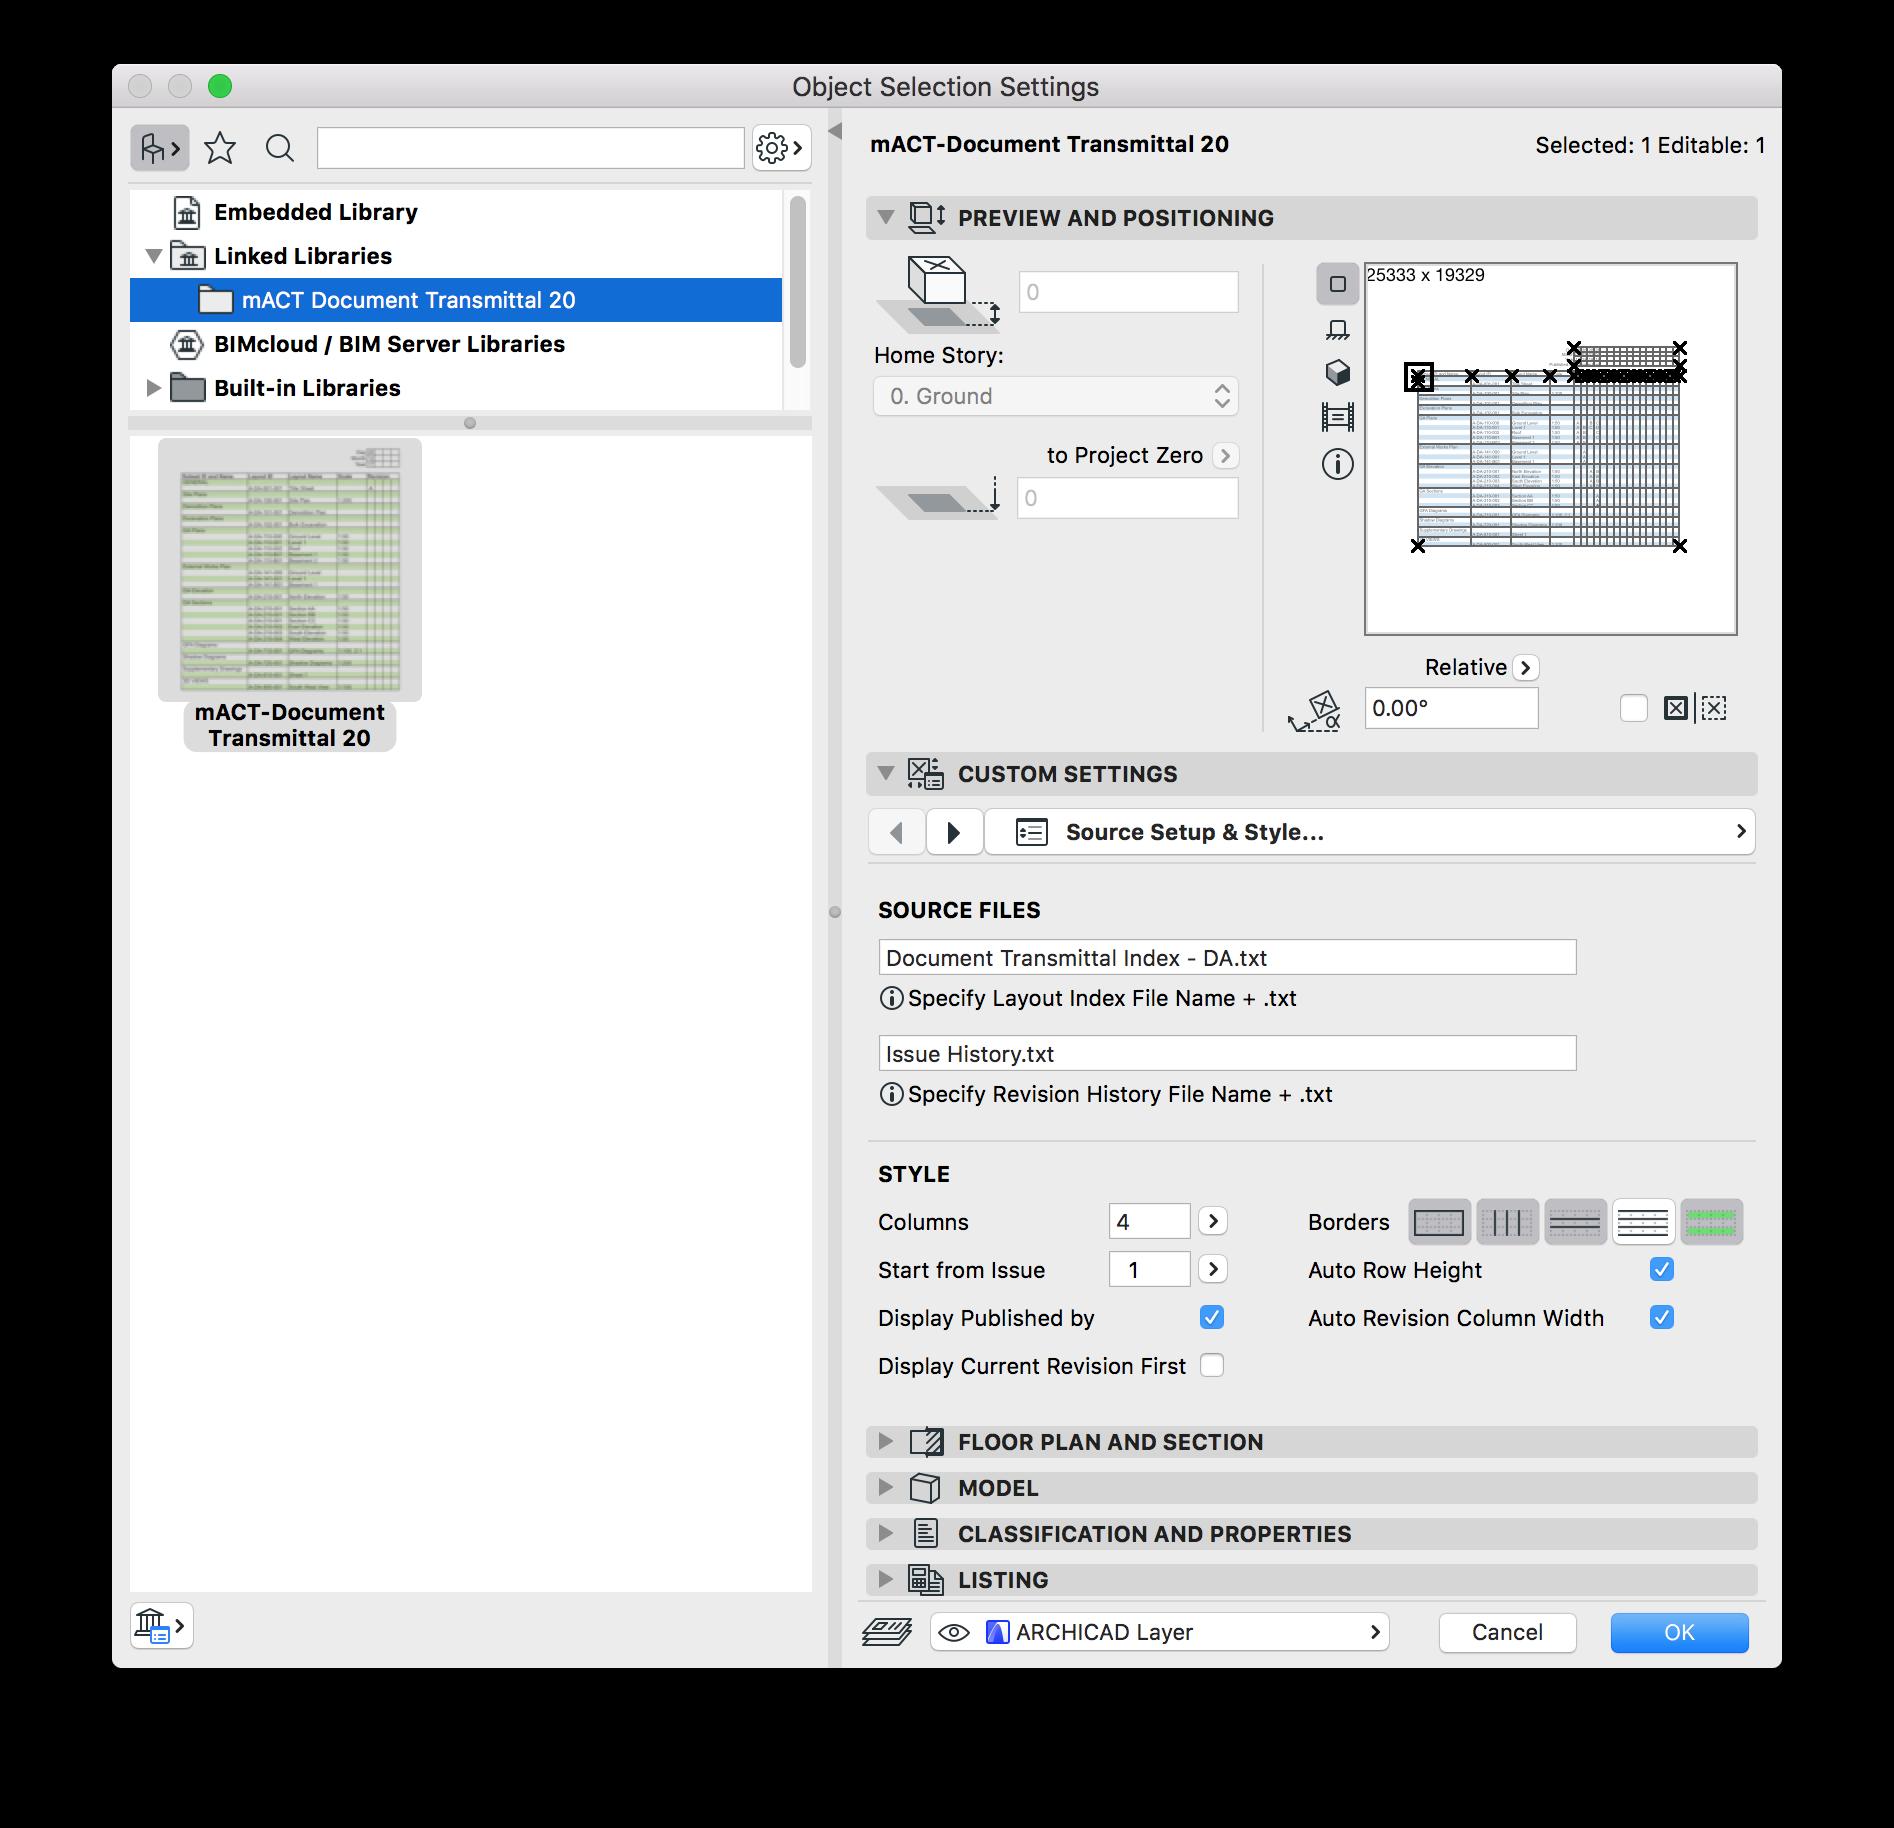 macinteract | Your Design Technology Matters